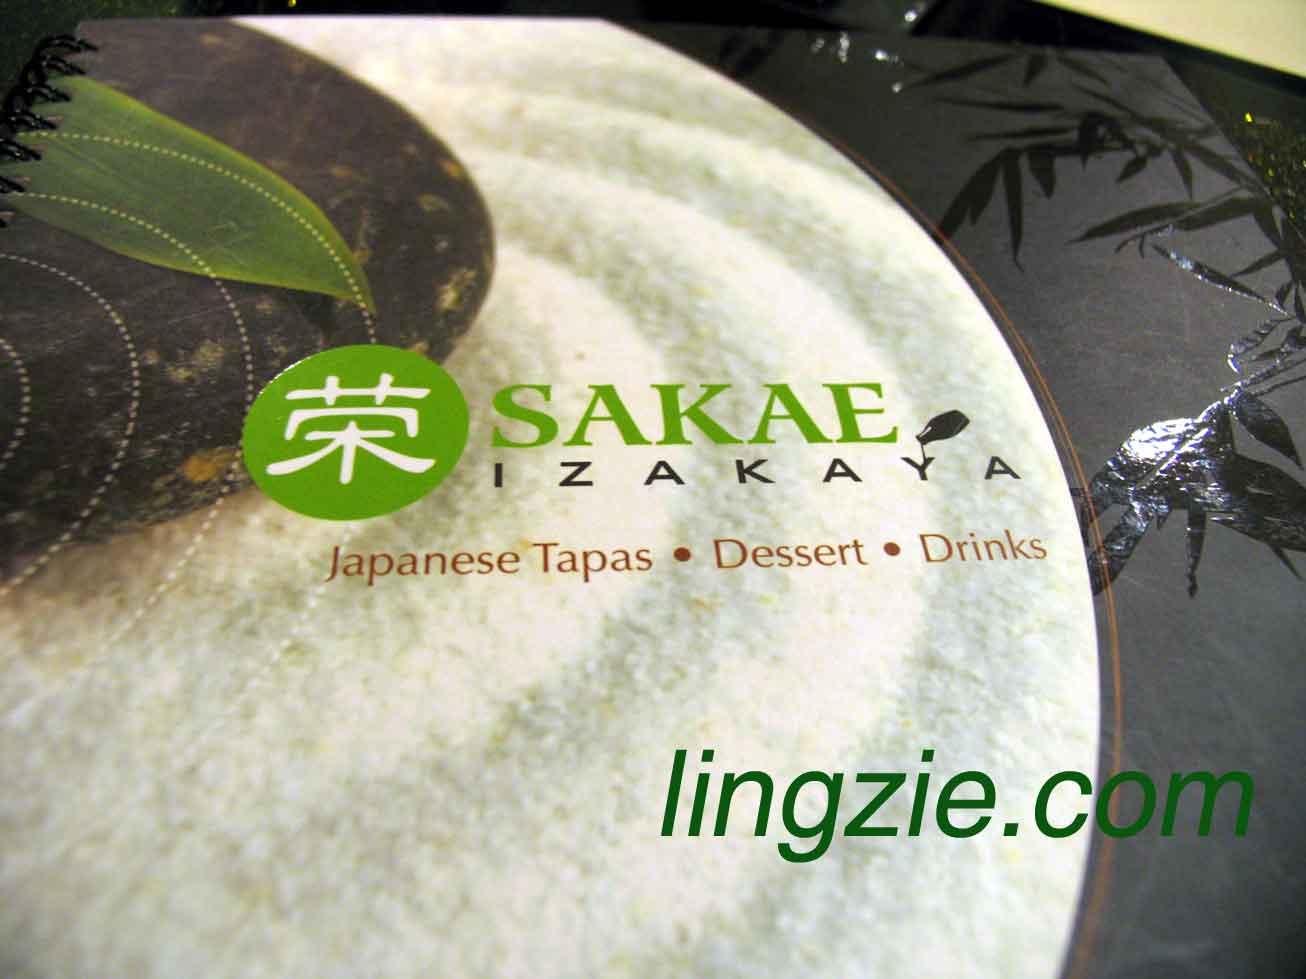 Sakae Izakaya Menu